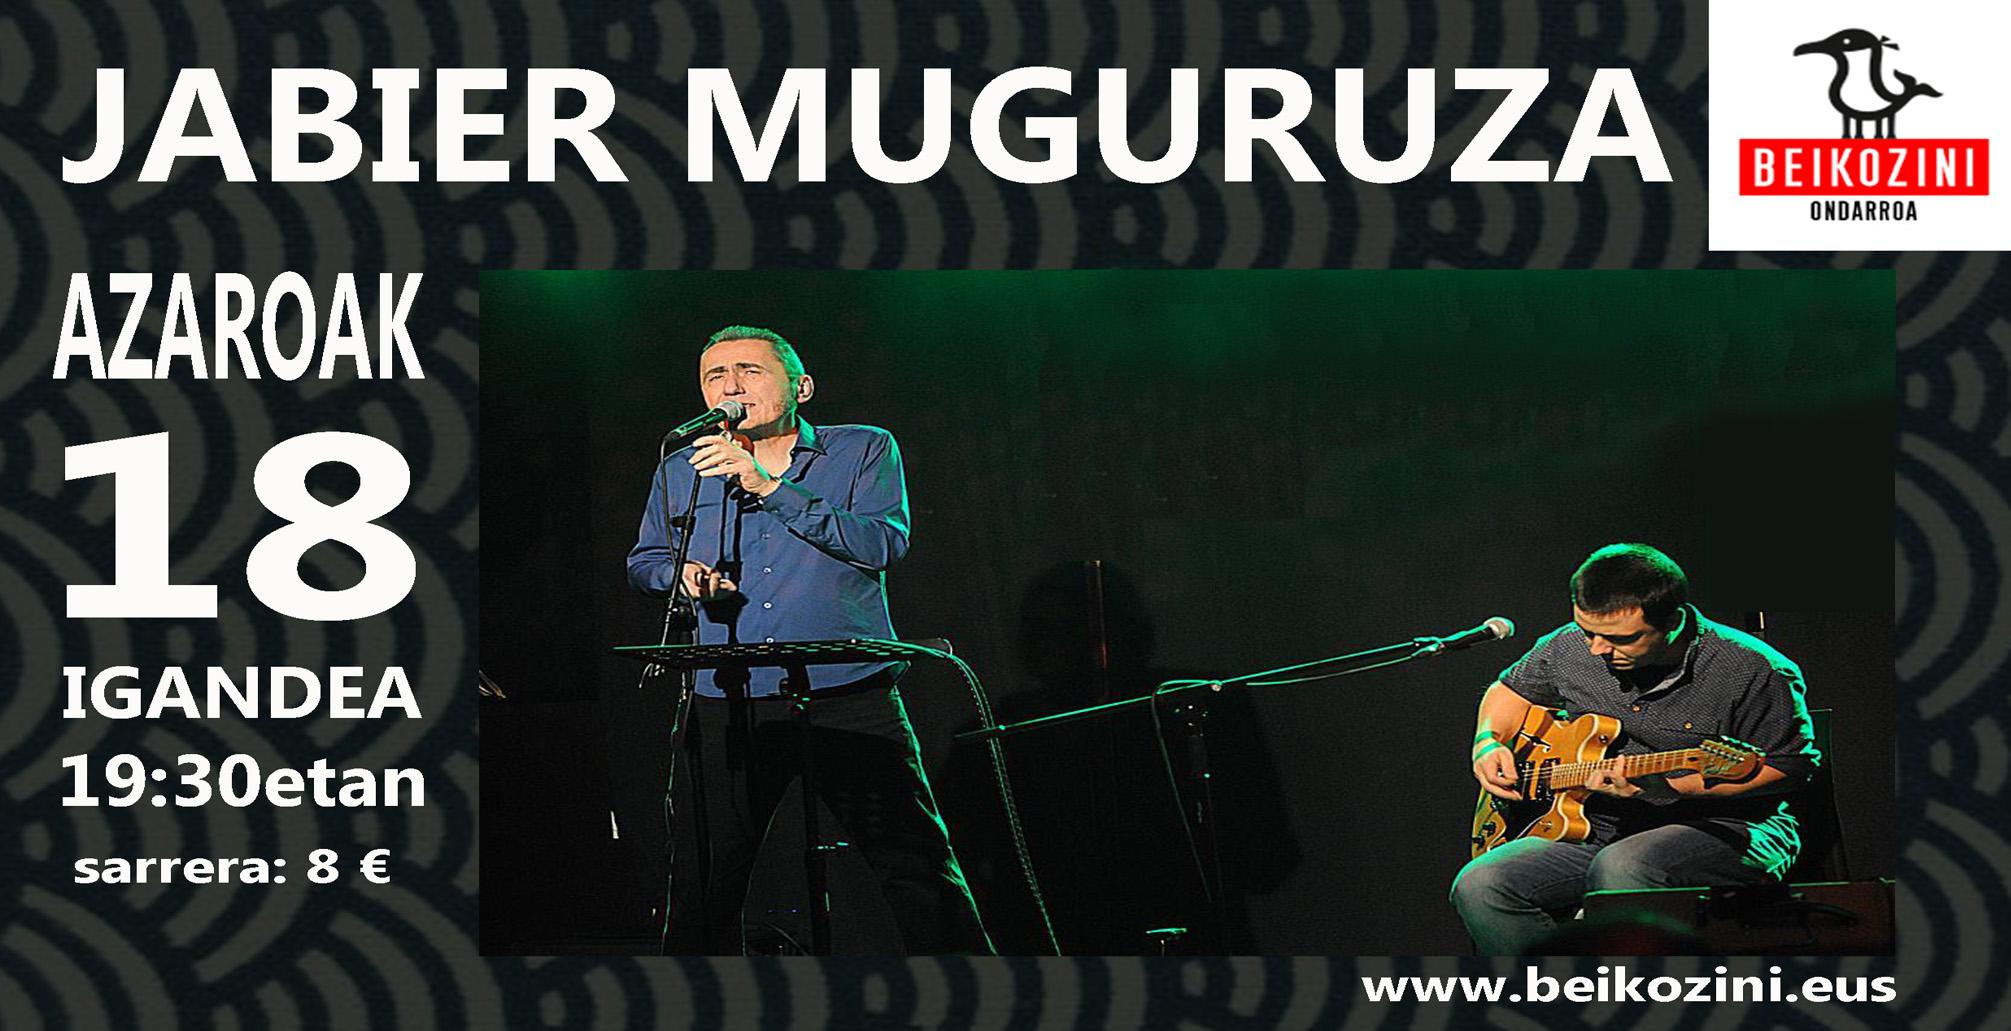 jabier-muguruza-slider1